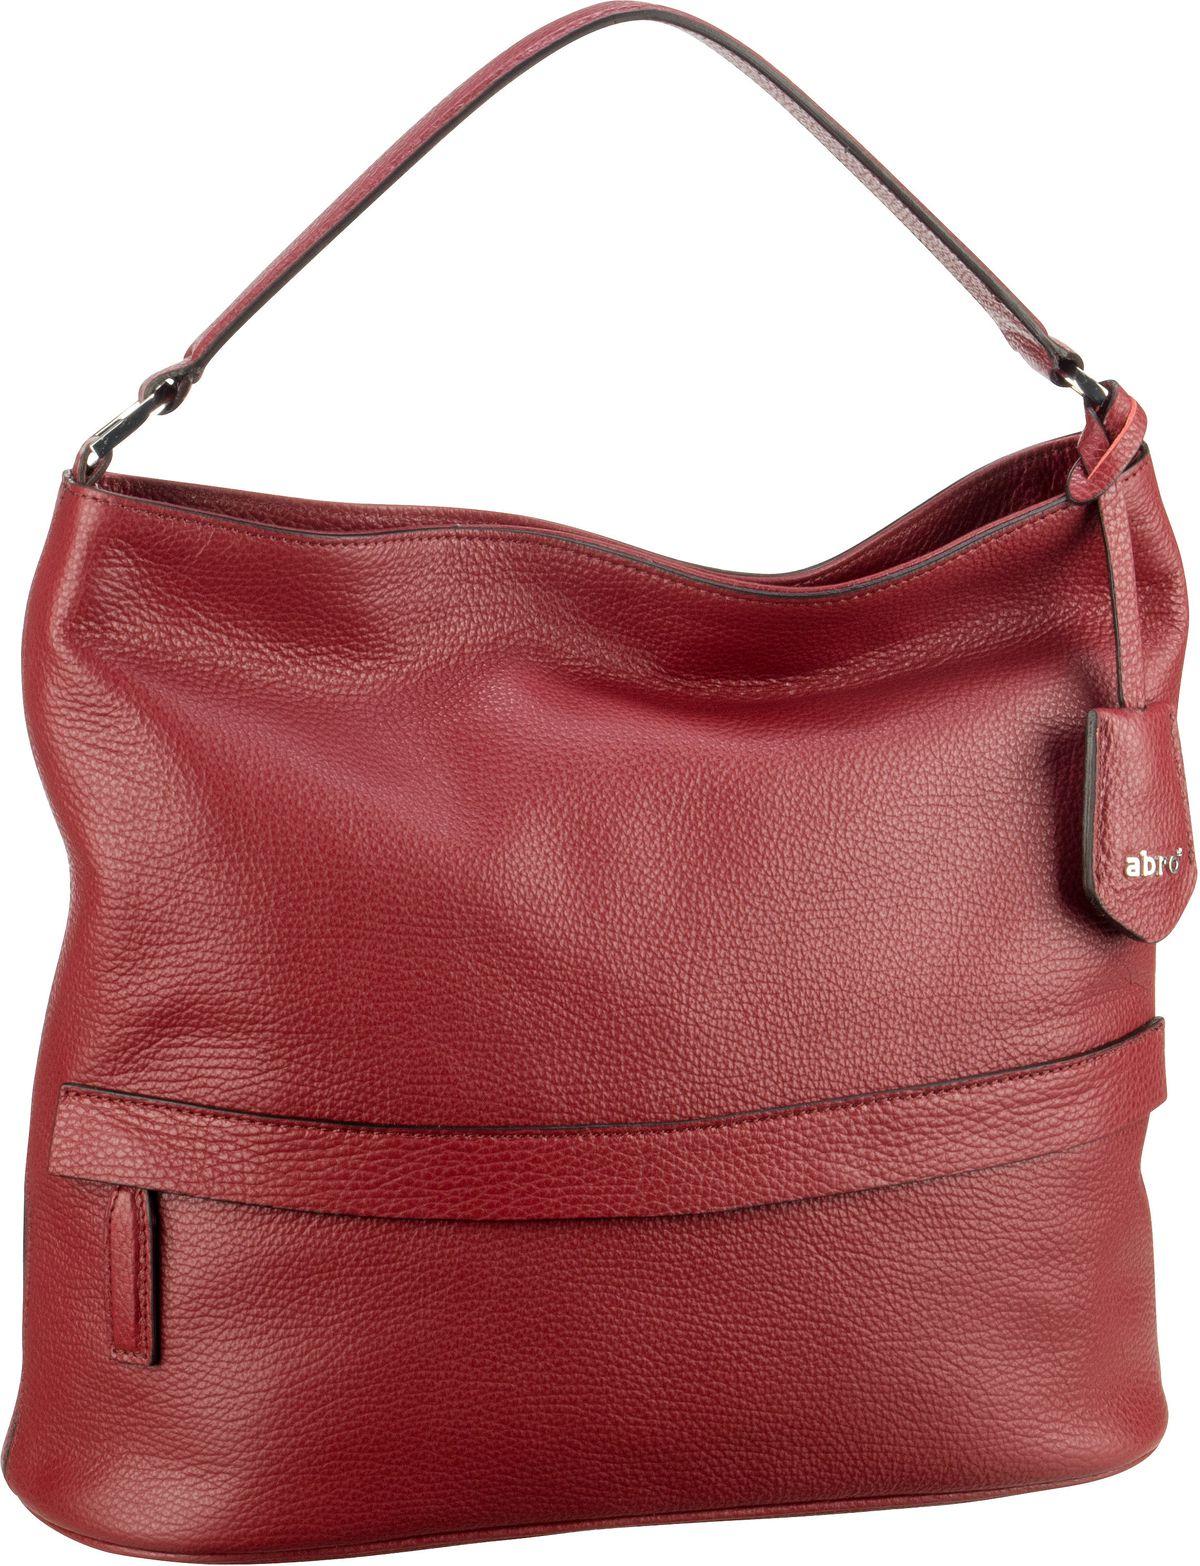 Handtasche Calf Adria 28581 Ruby